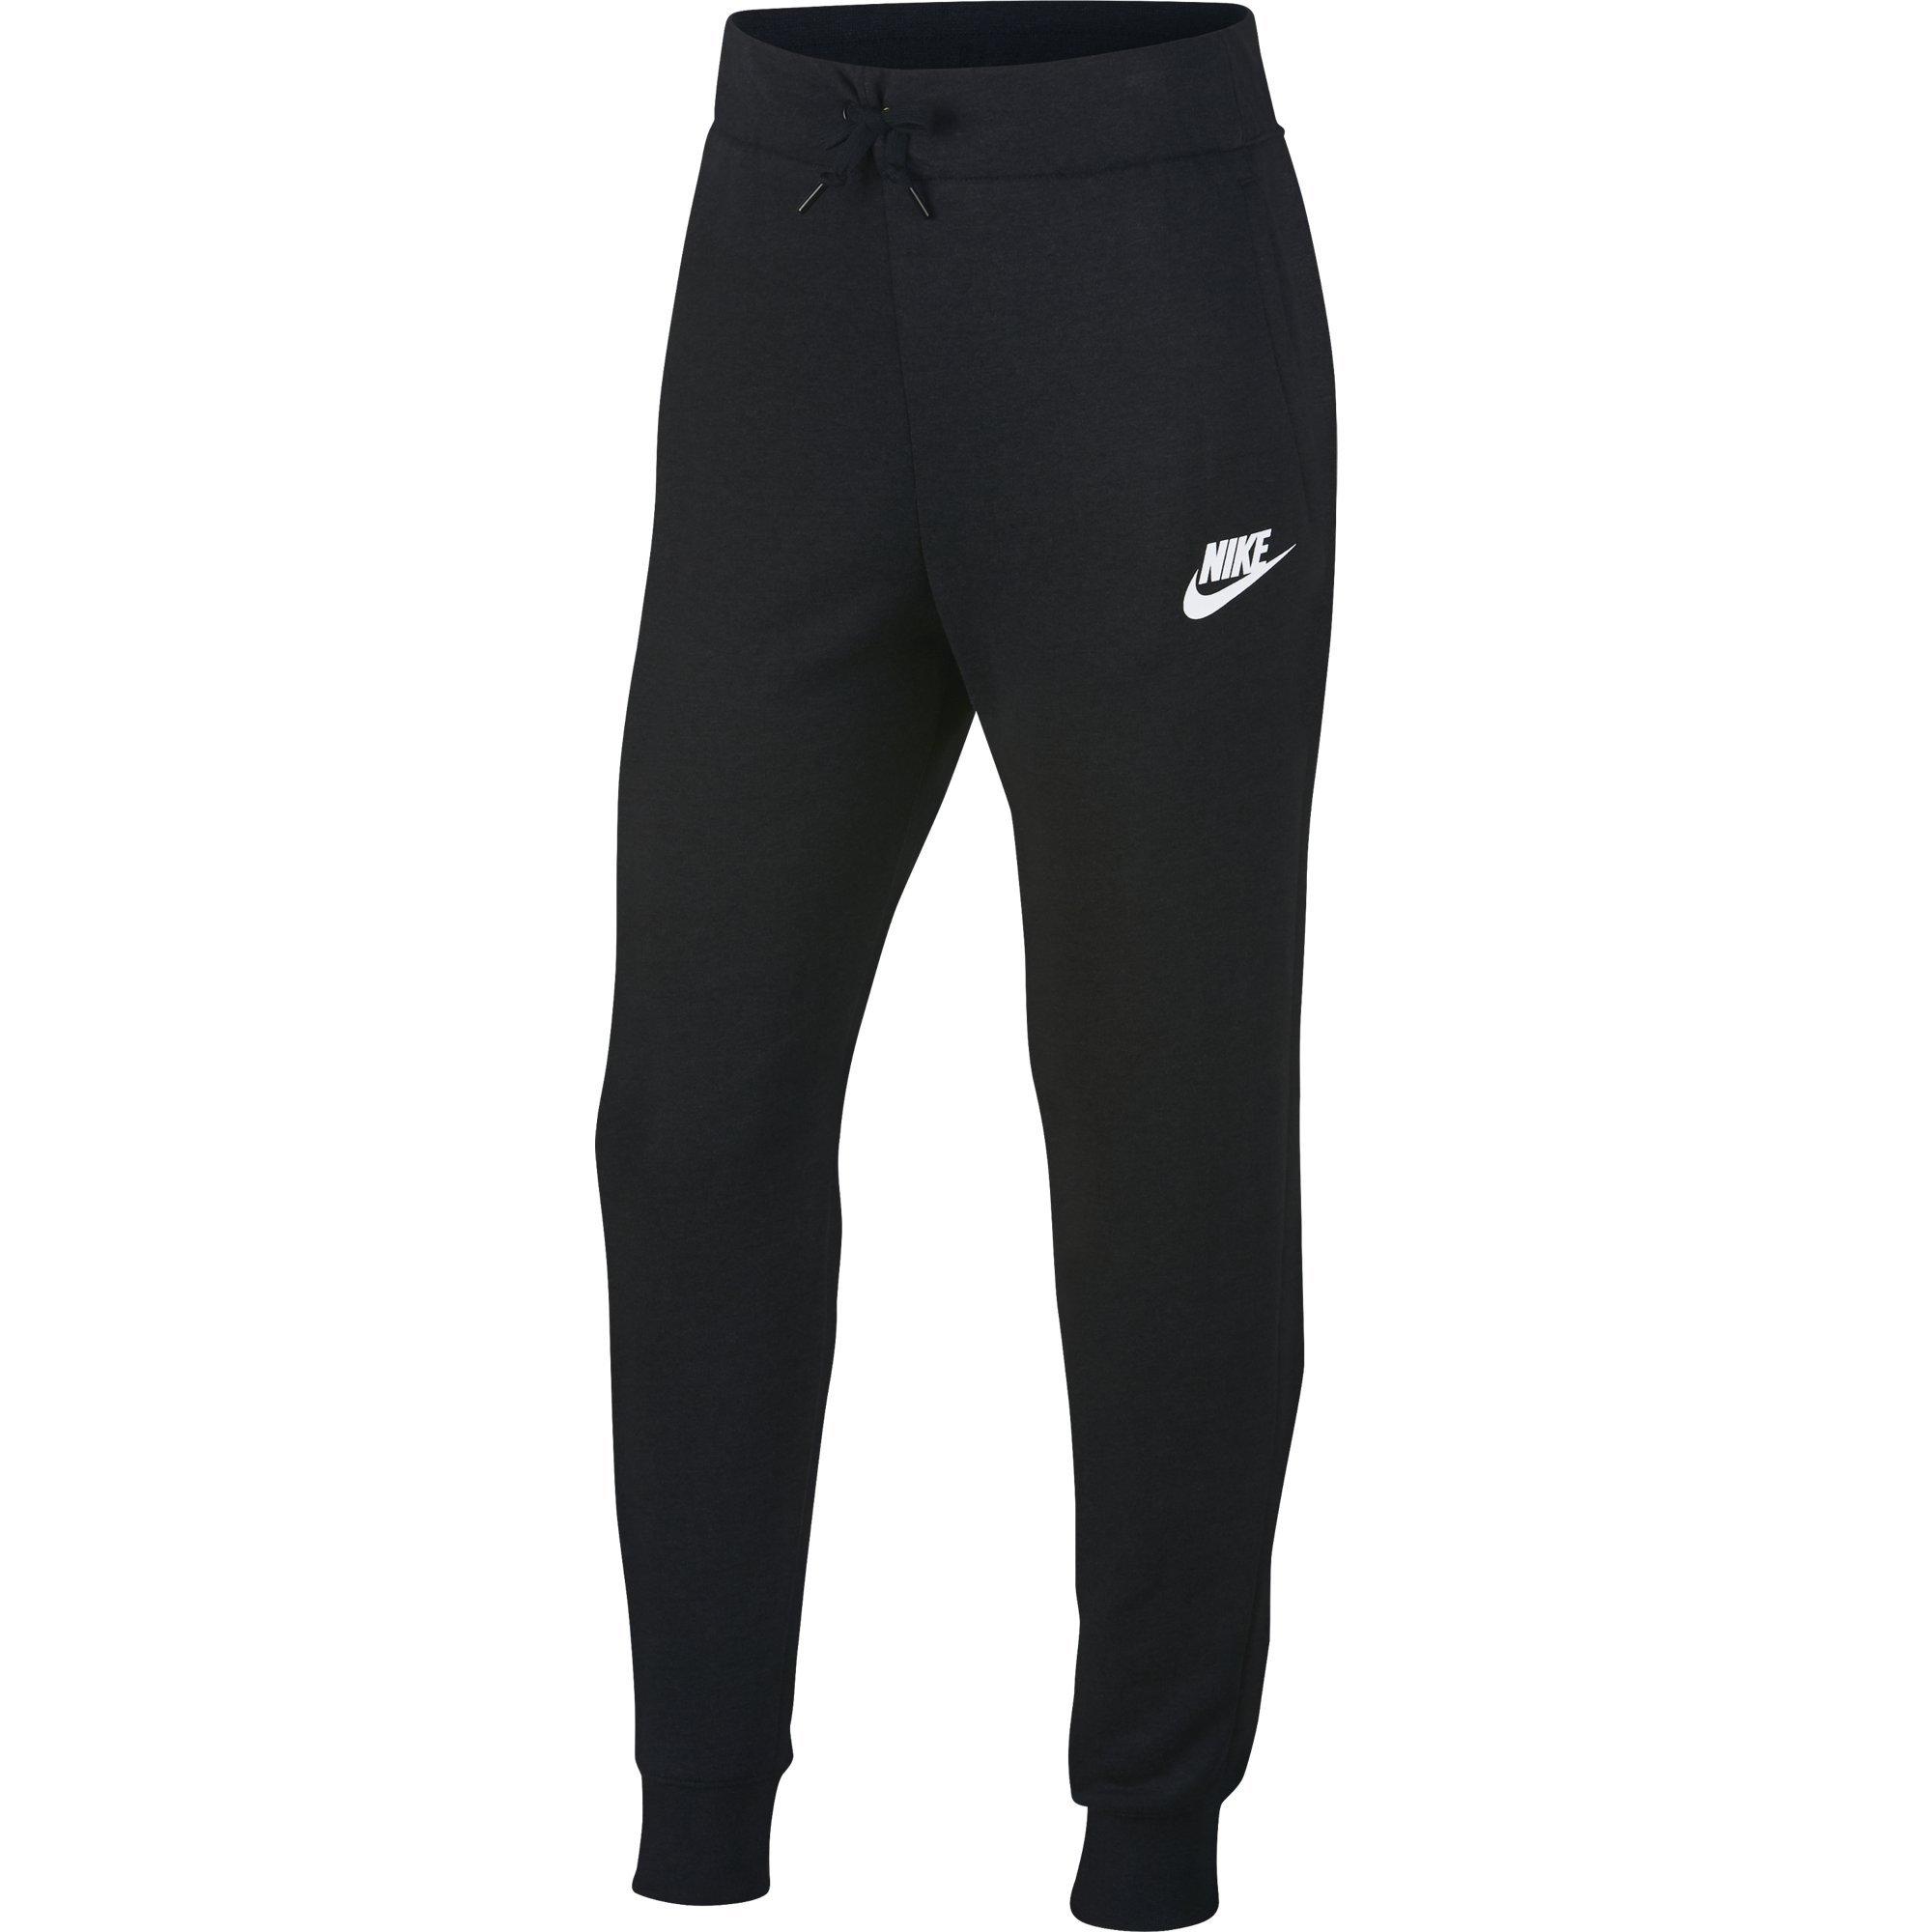 NIKE Sportswear Girls' Pants, Black/White, X-Small by Nike